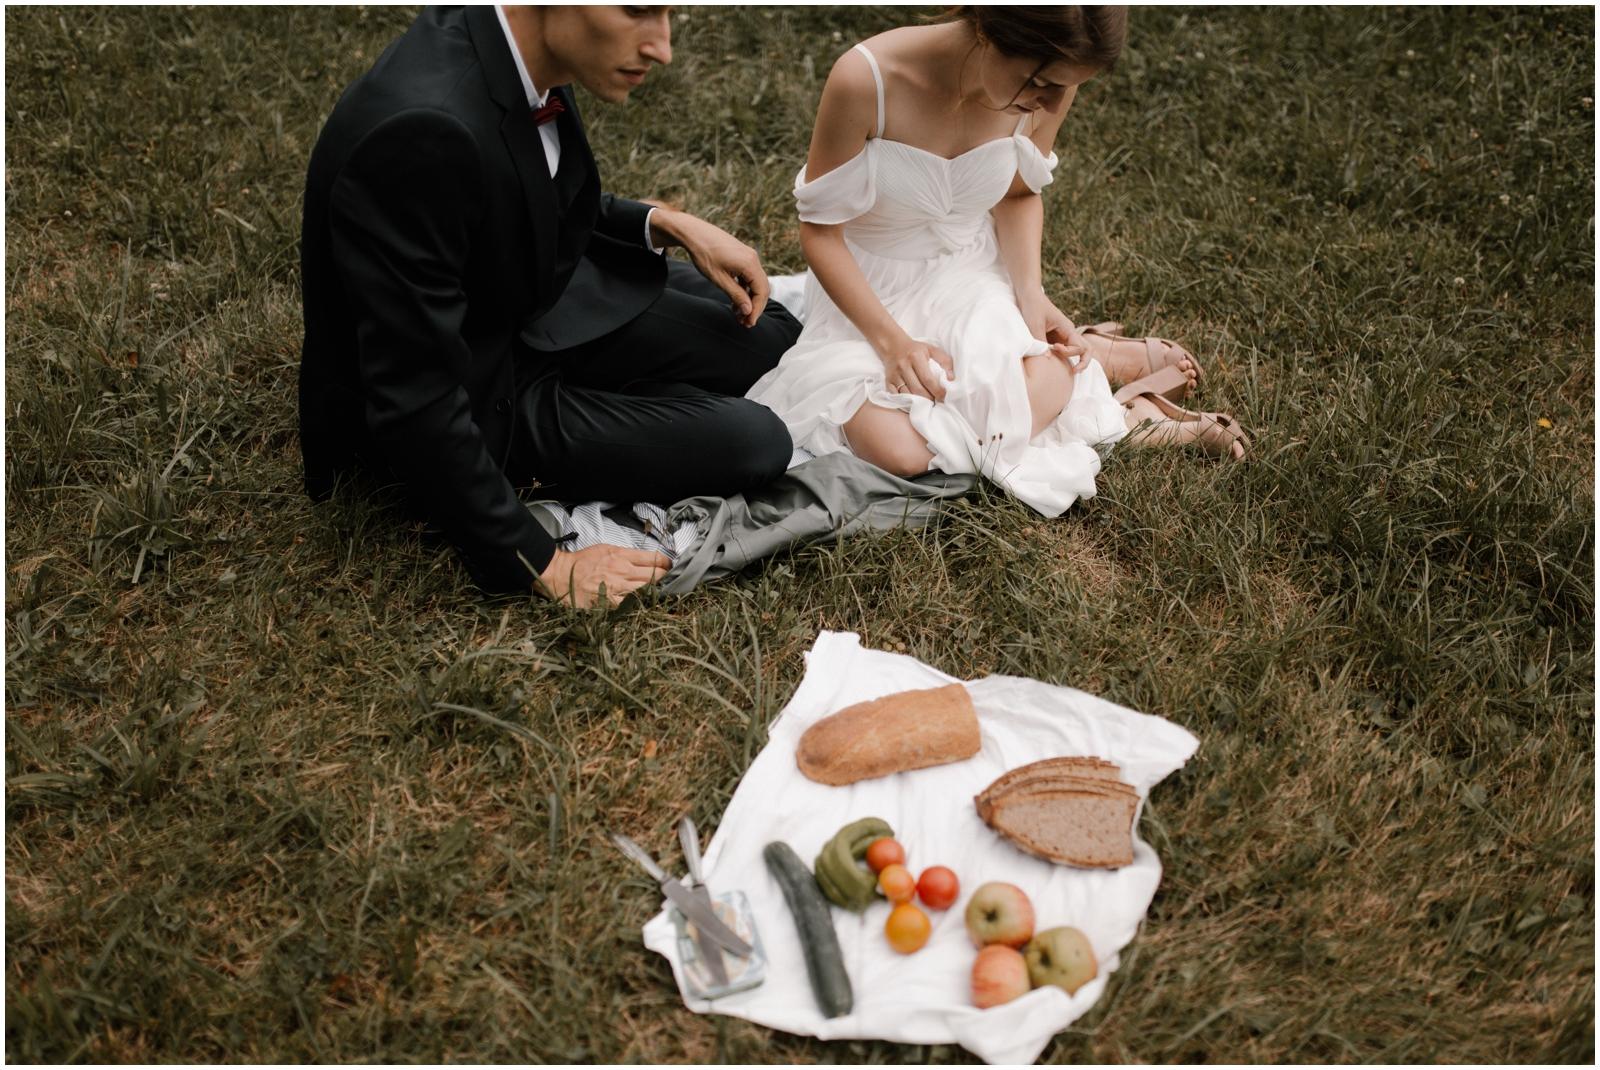 mirjam_thomas_wedding-215.jpg